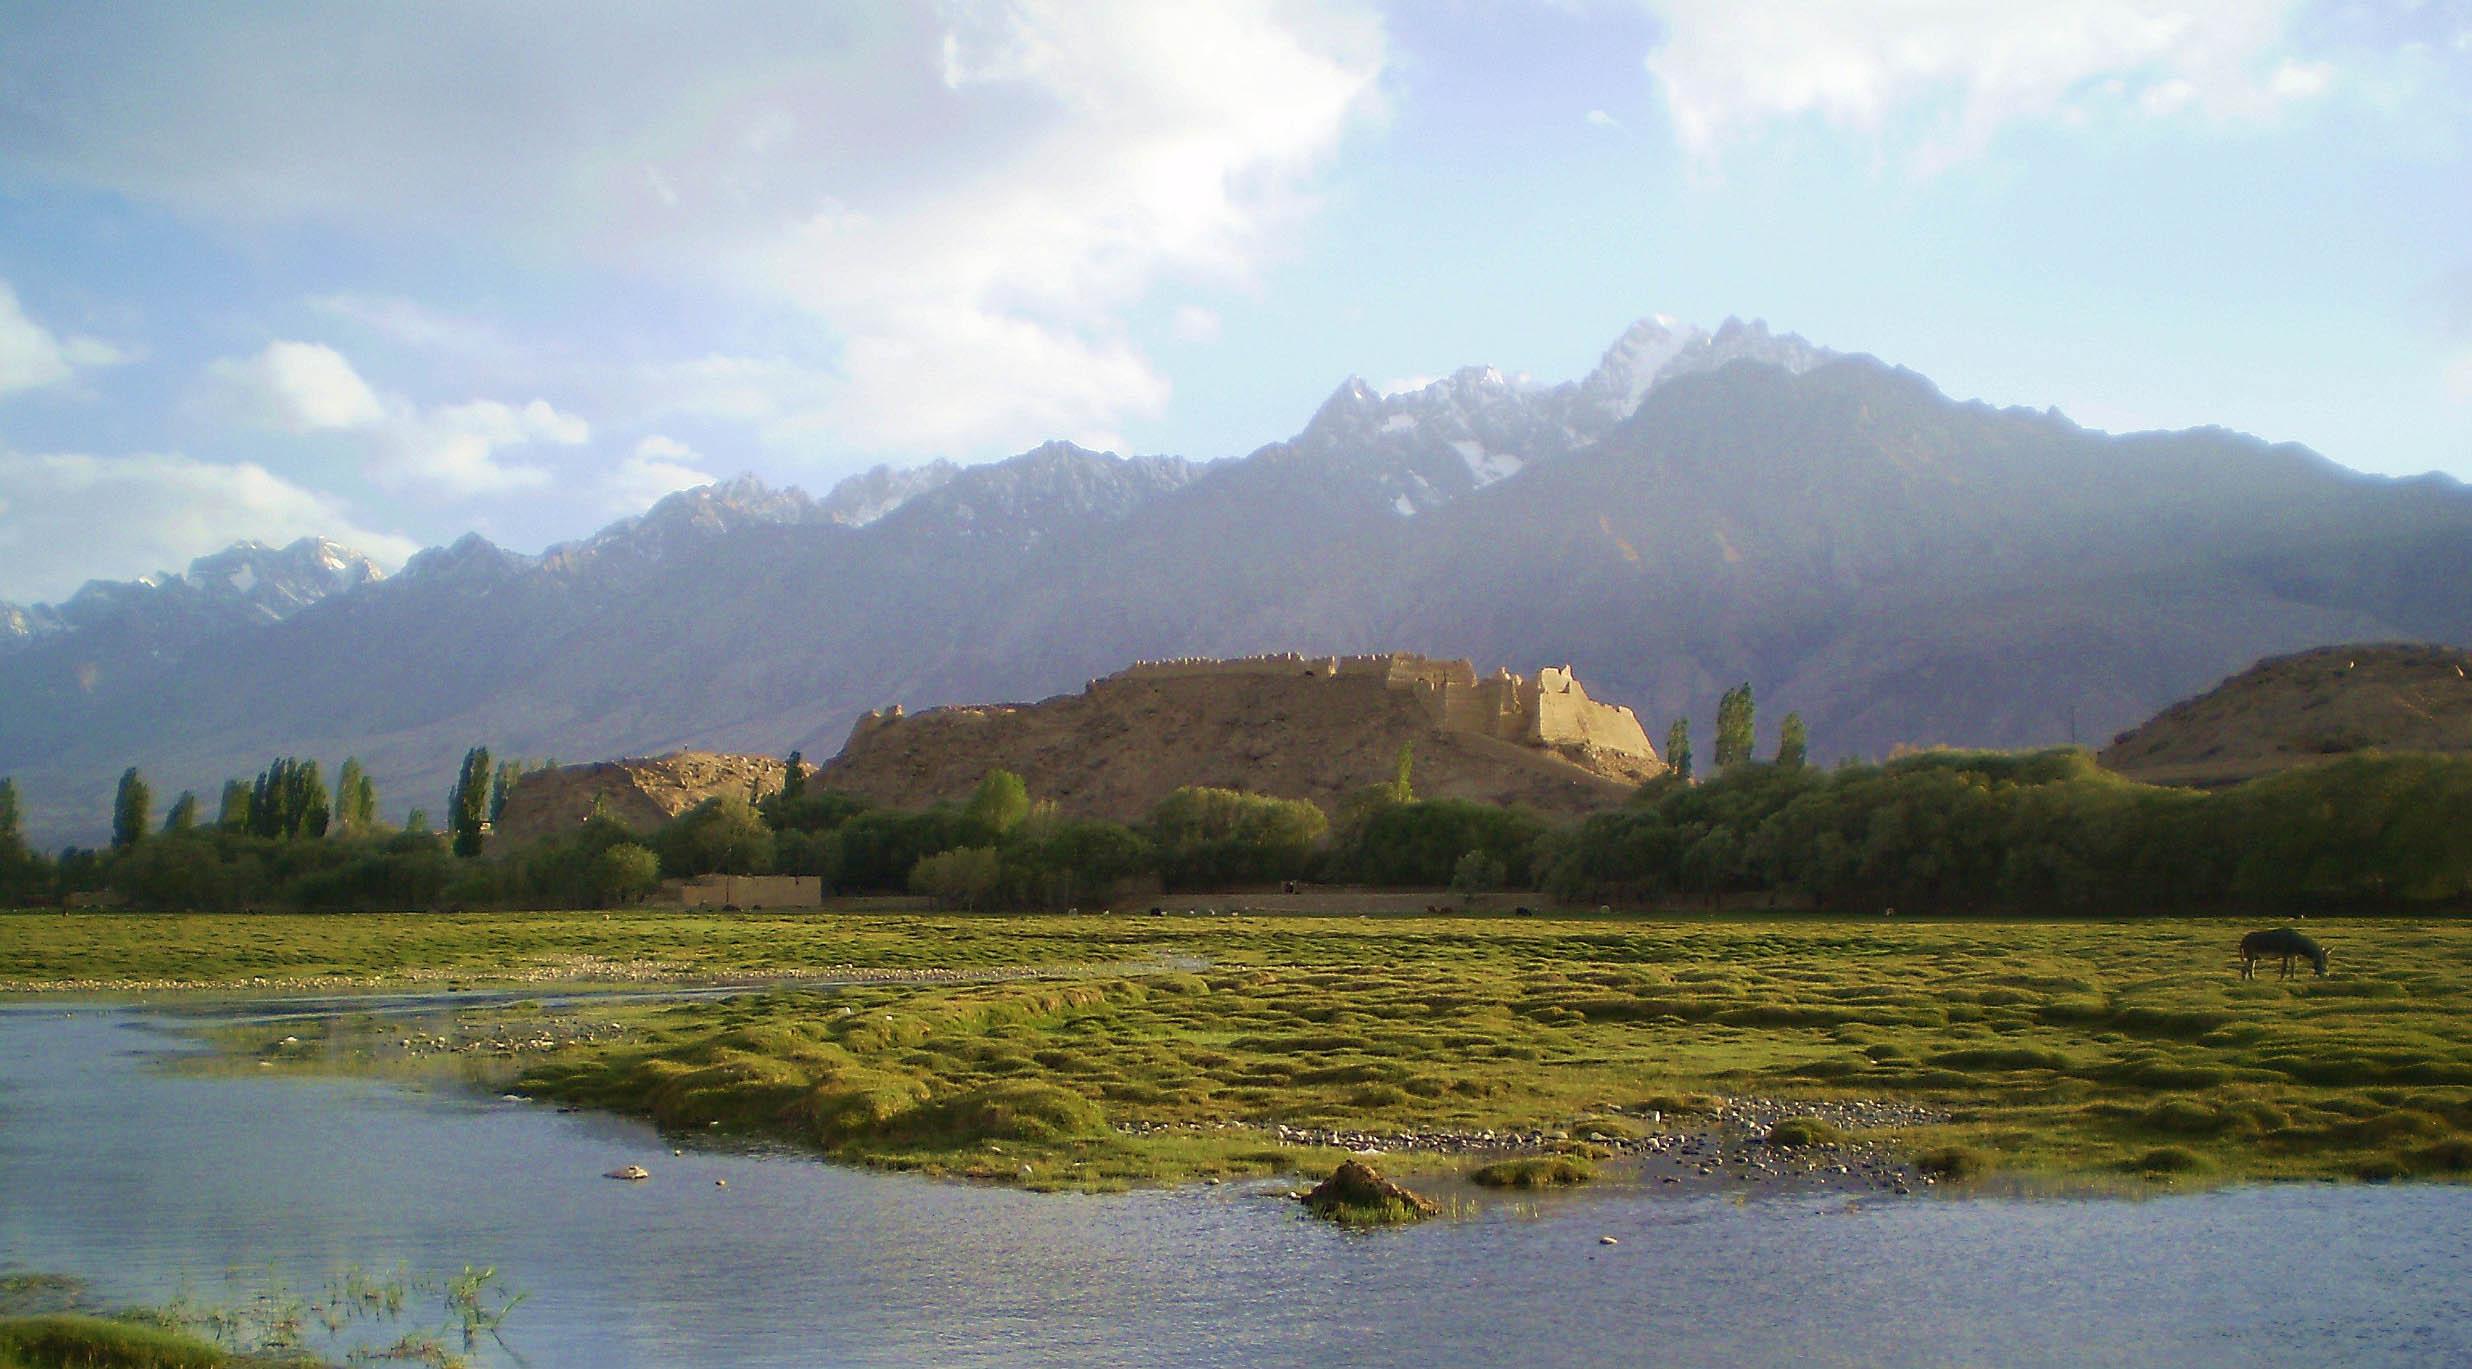 Tashkurgan - El Viaje del Monje Xuan Zang